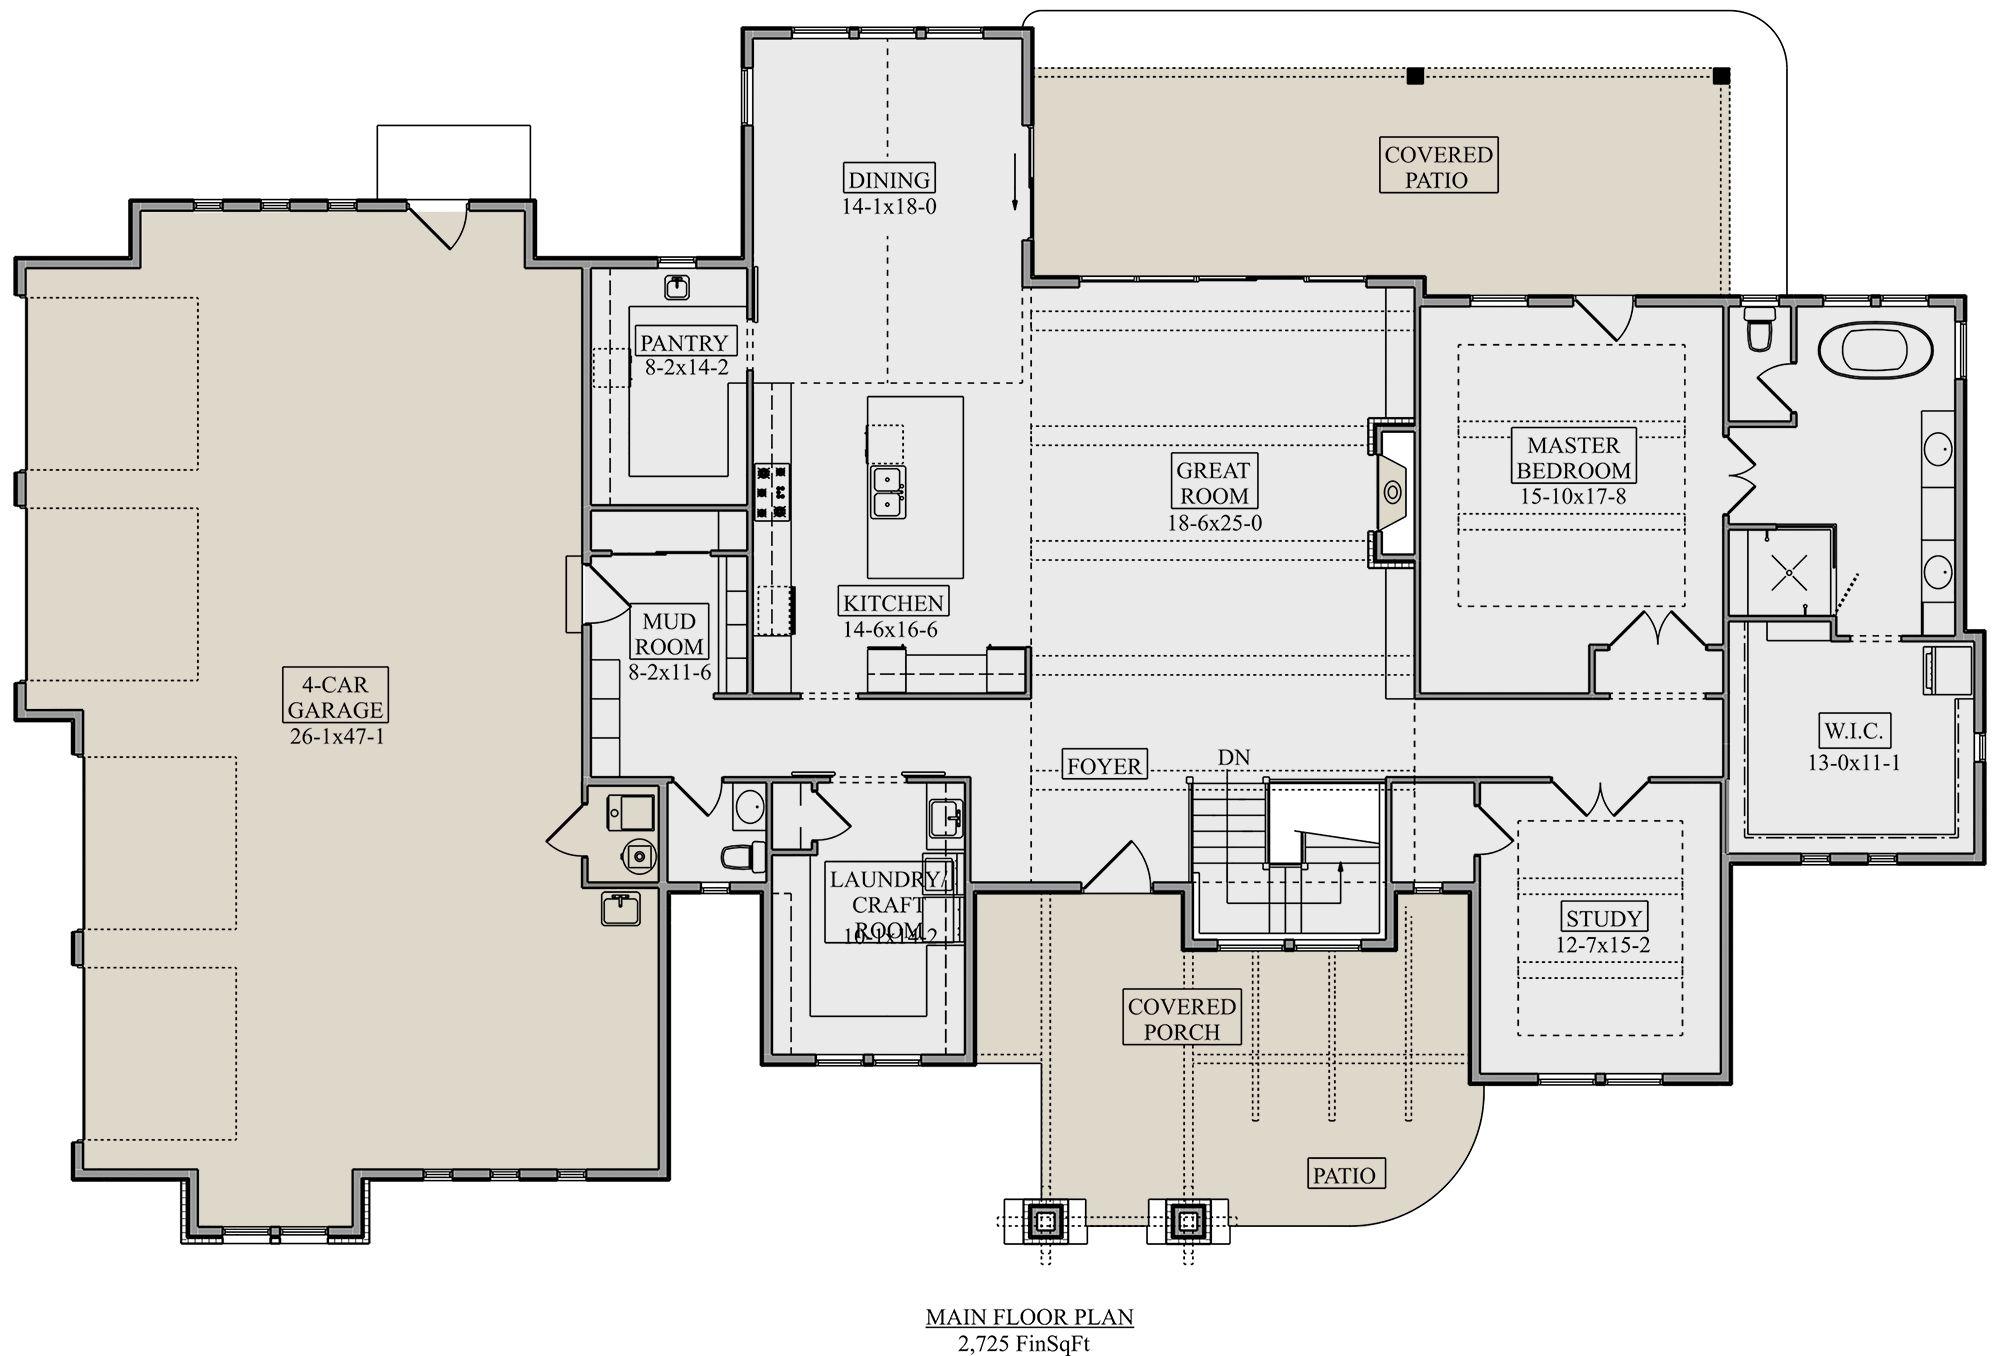 House Plan 5631 00120 Craftsman Plan 2 725 Square Feet 1 4 Bedrooms 1 5 Bathrooms 1 Bedroom House Plans Floor Plans Ranch House Plans